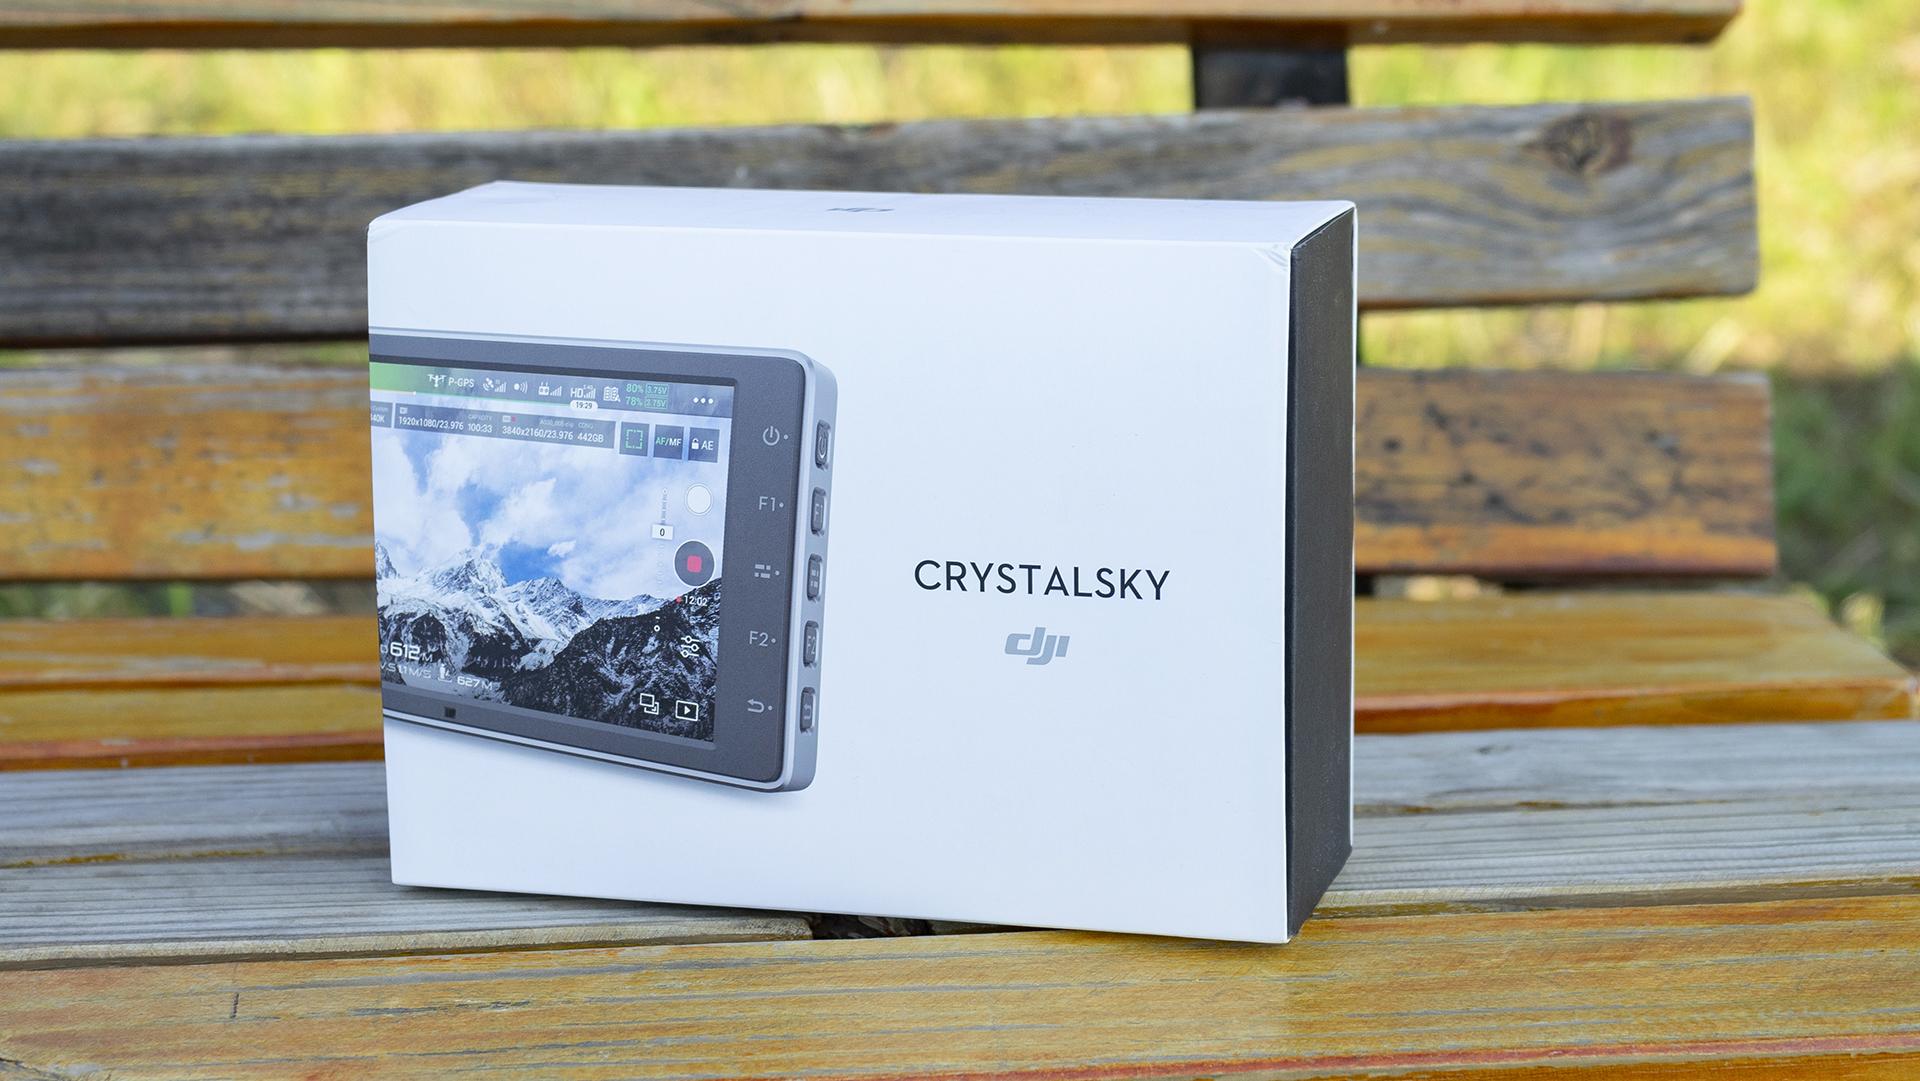 Crystalsky_2.jpg